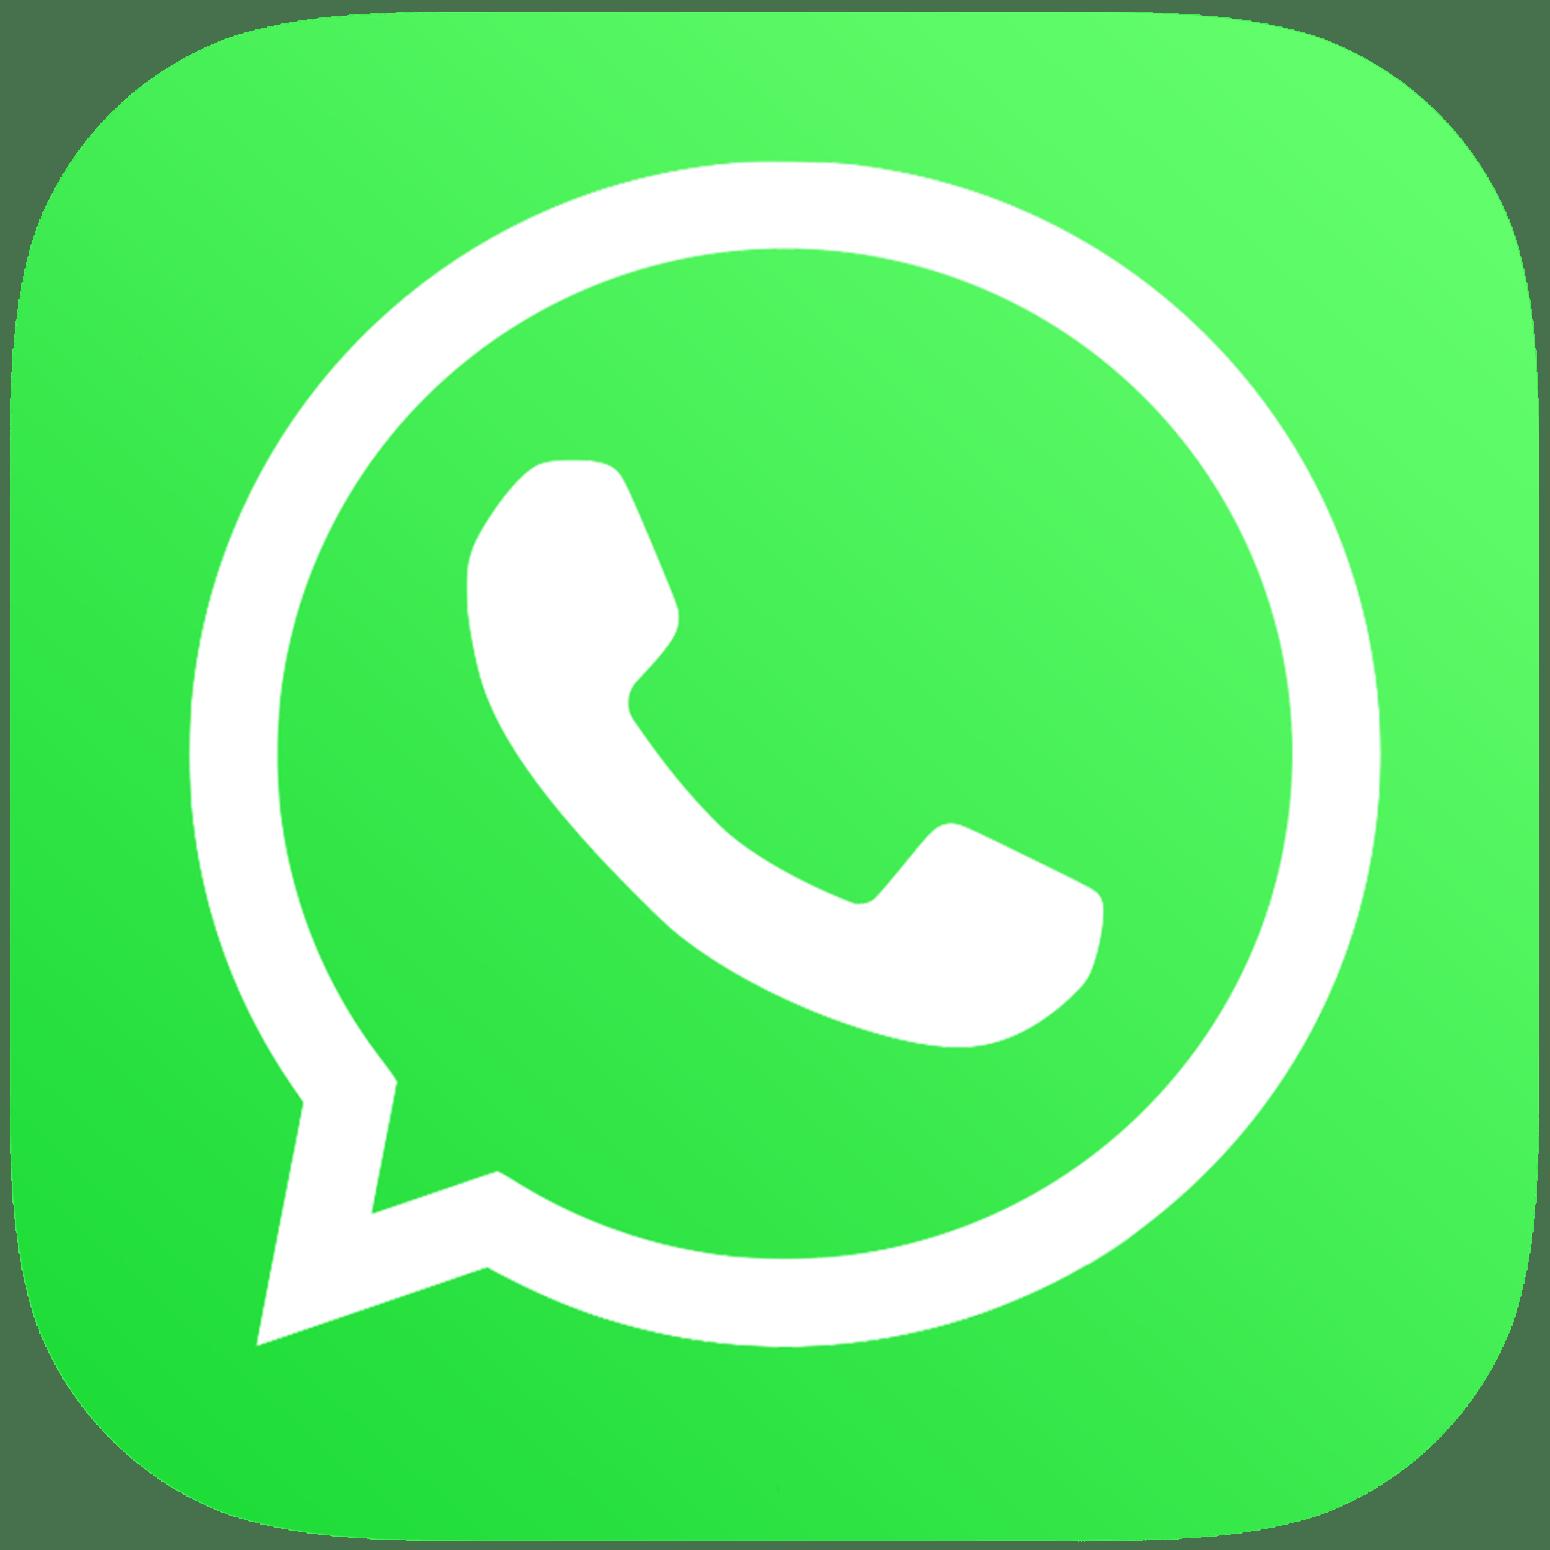 WhatsApp deelsuggesties raadplegen in deelmenu - appletips